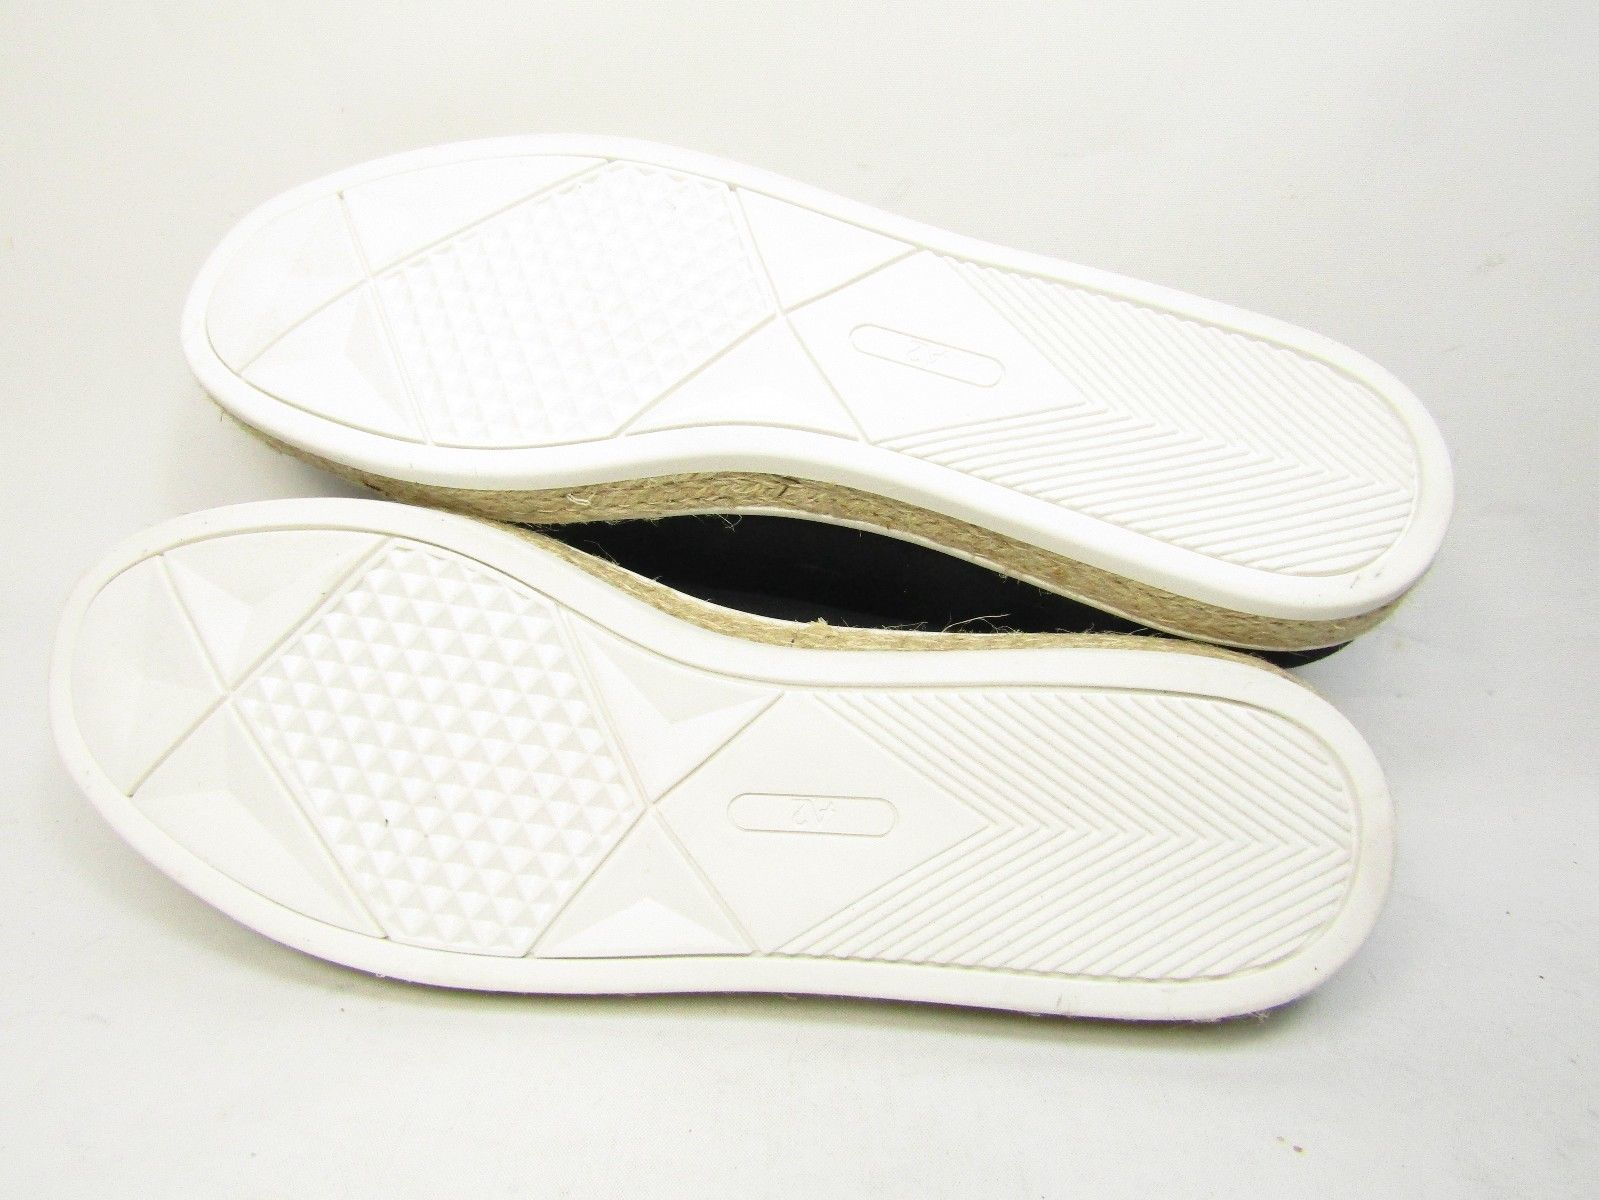 A2 by Aerosoles Funny Bone Womens Slip-On Shoes Black Size 9M